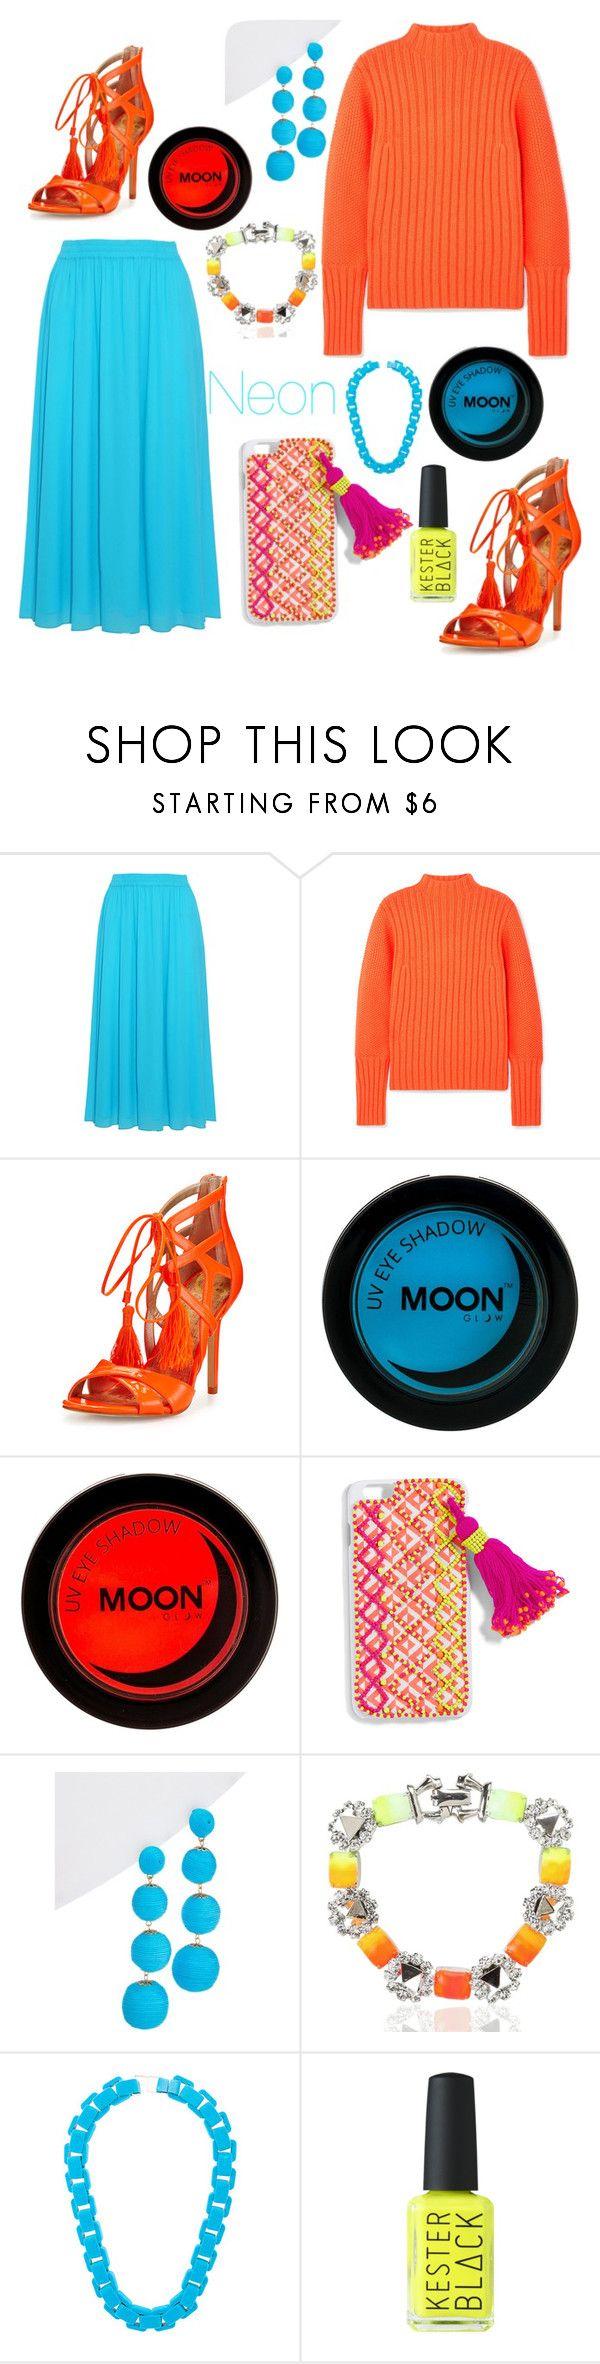 """Neon"" by daisy-schilder ❤ liked on Polyvore featuring Emilio Pucci, Victoria, Victoria Beckham, Sam Edelman, BaubleBar, Kenneth Jay Lane, Tom Binns, Wanda Nylon and neon"